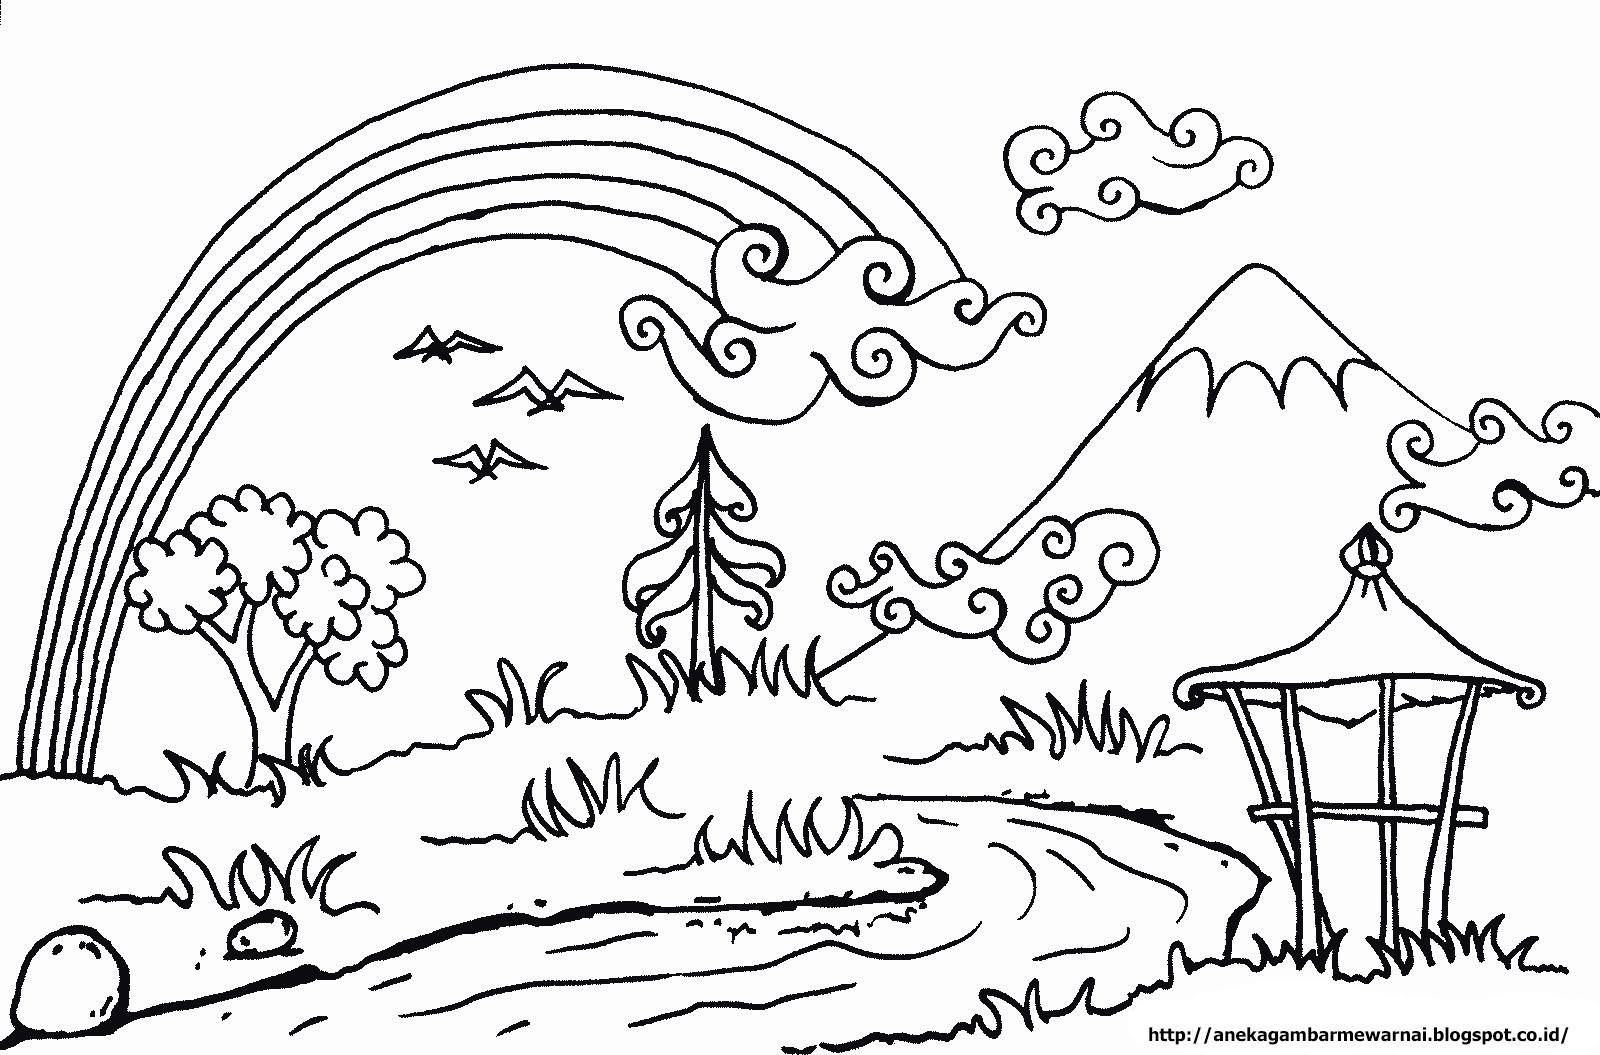 Aneka Gambar Mewarnai Gambar Mewarnai Pemandangan Langit Cerah Untuk Anak PAUD dan TK 2